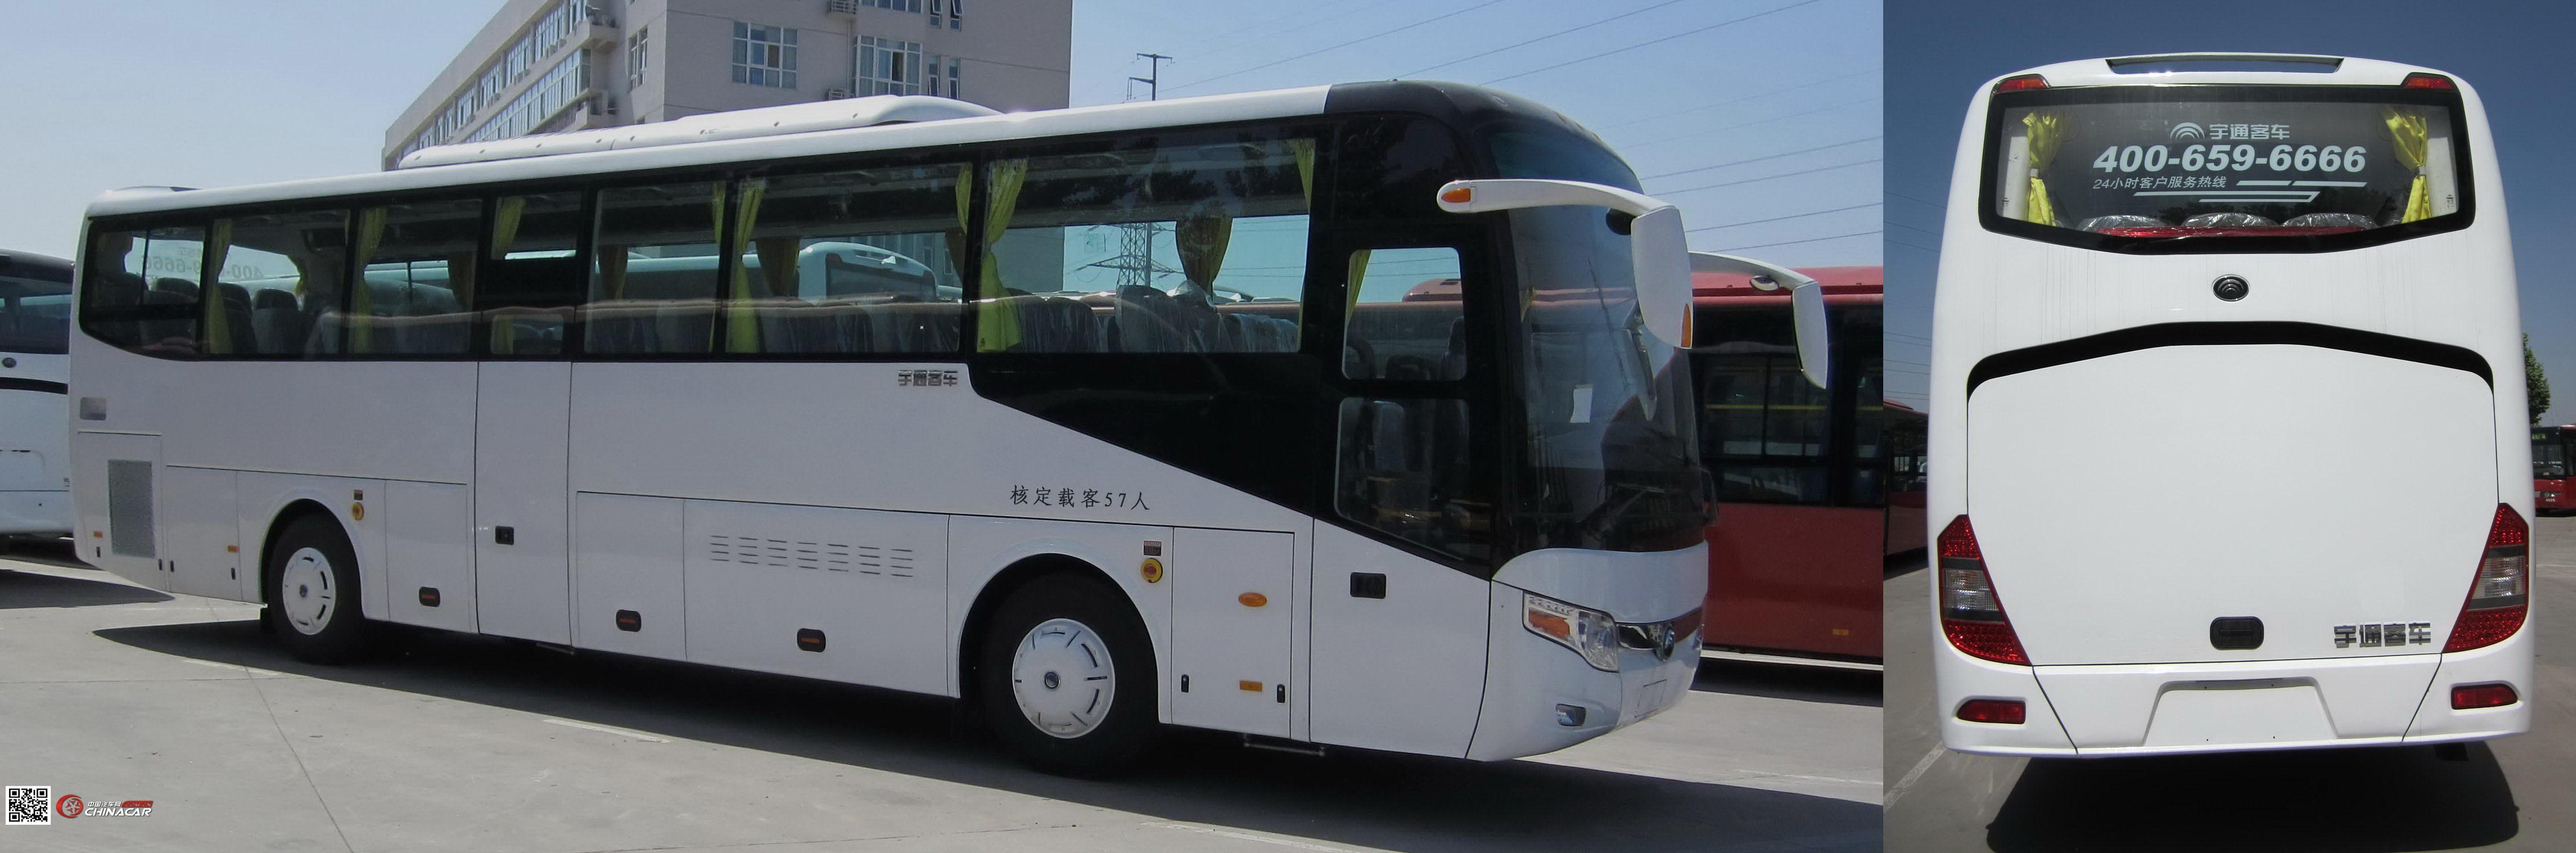 ��n~zK�2�r'���f��W��吗_宇通牌zk6122hnq8e型客车图片